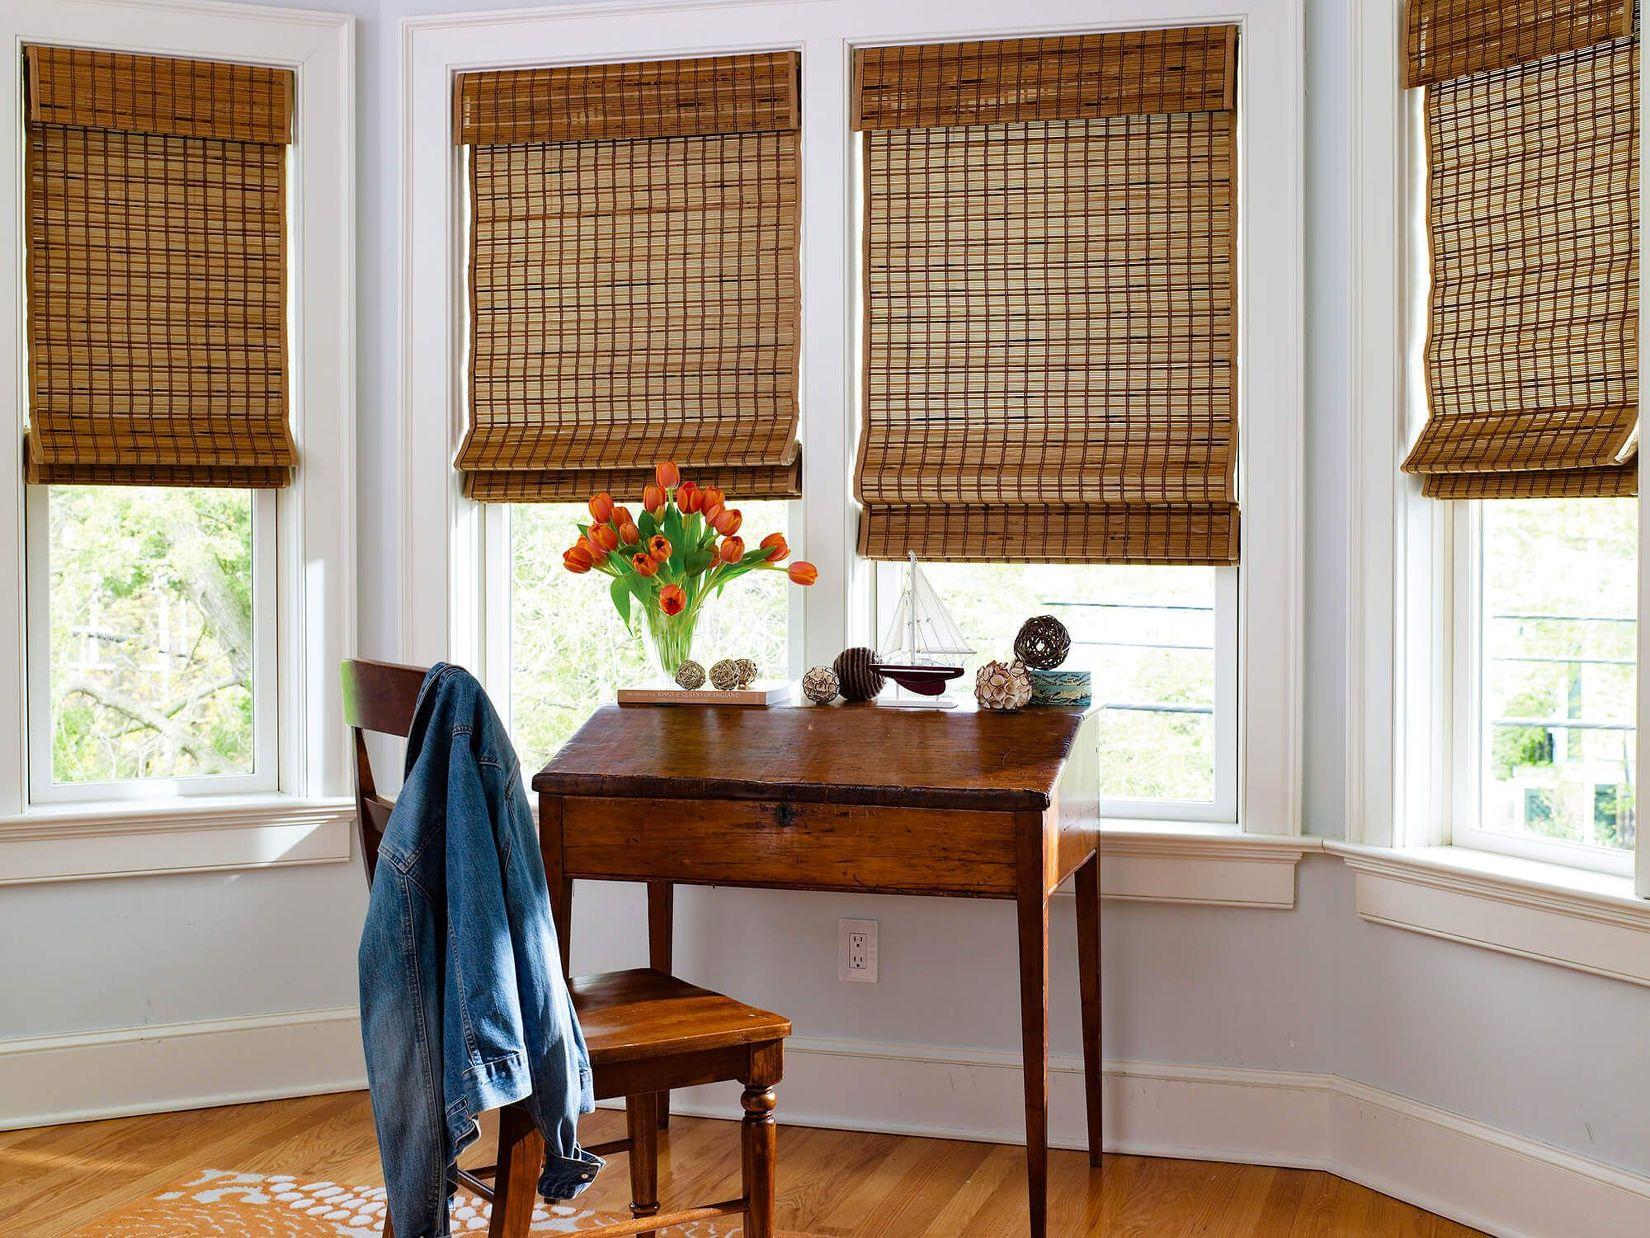 Enjoy the elegant woven wood shades